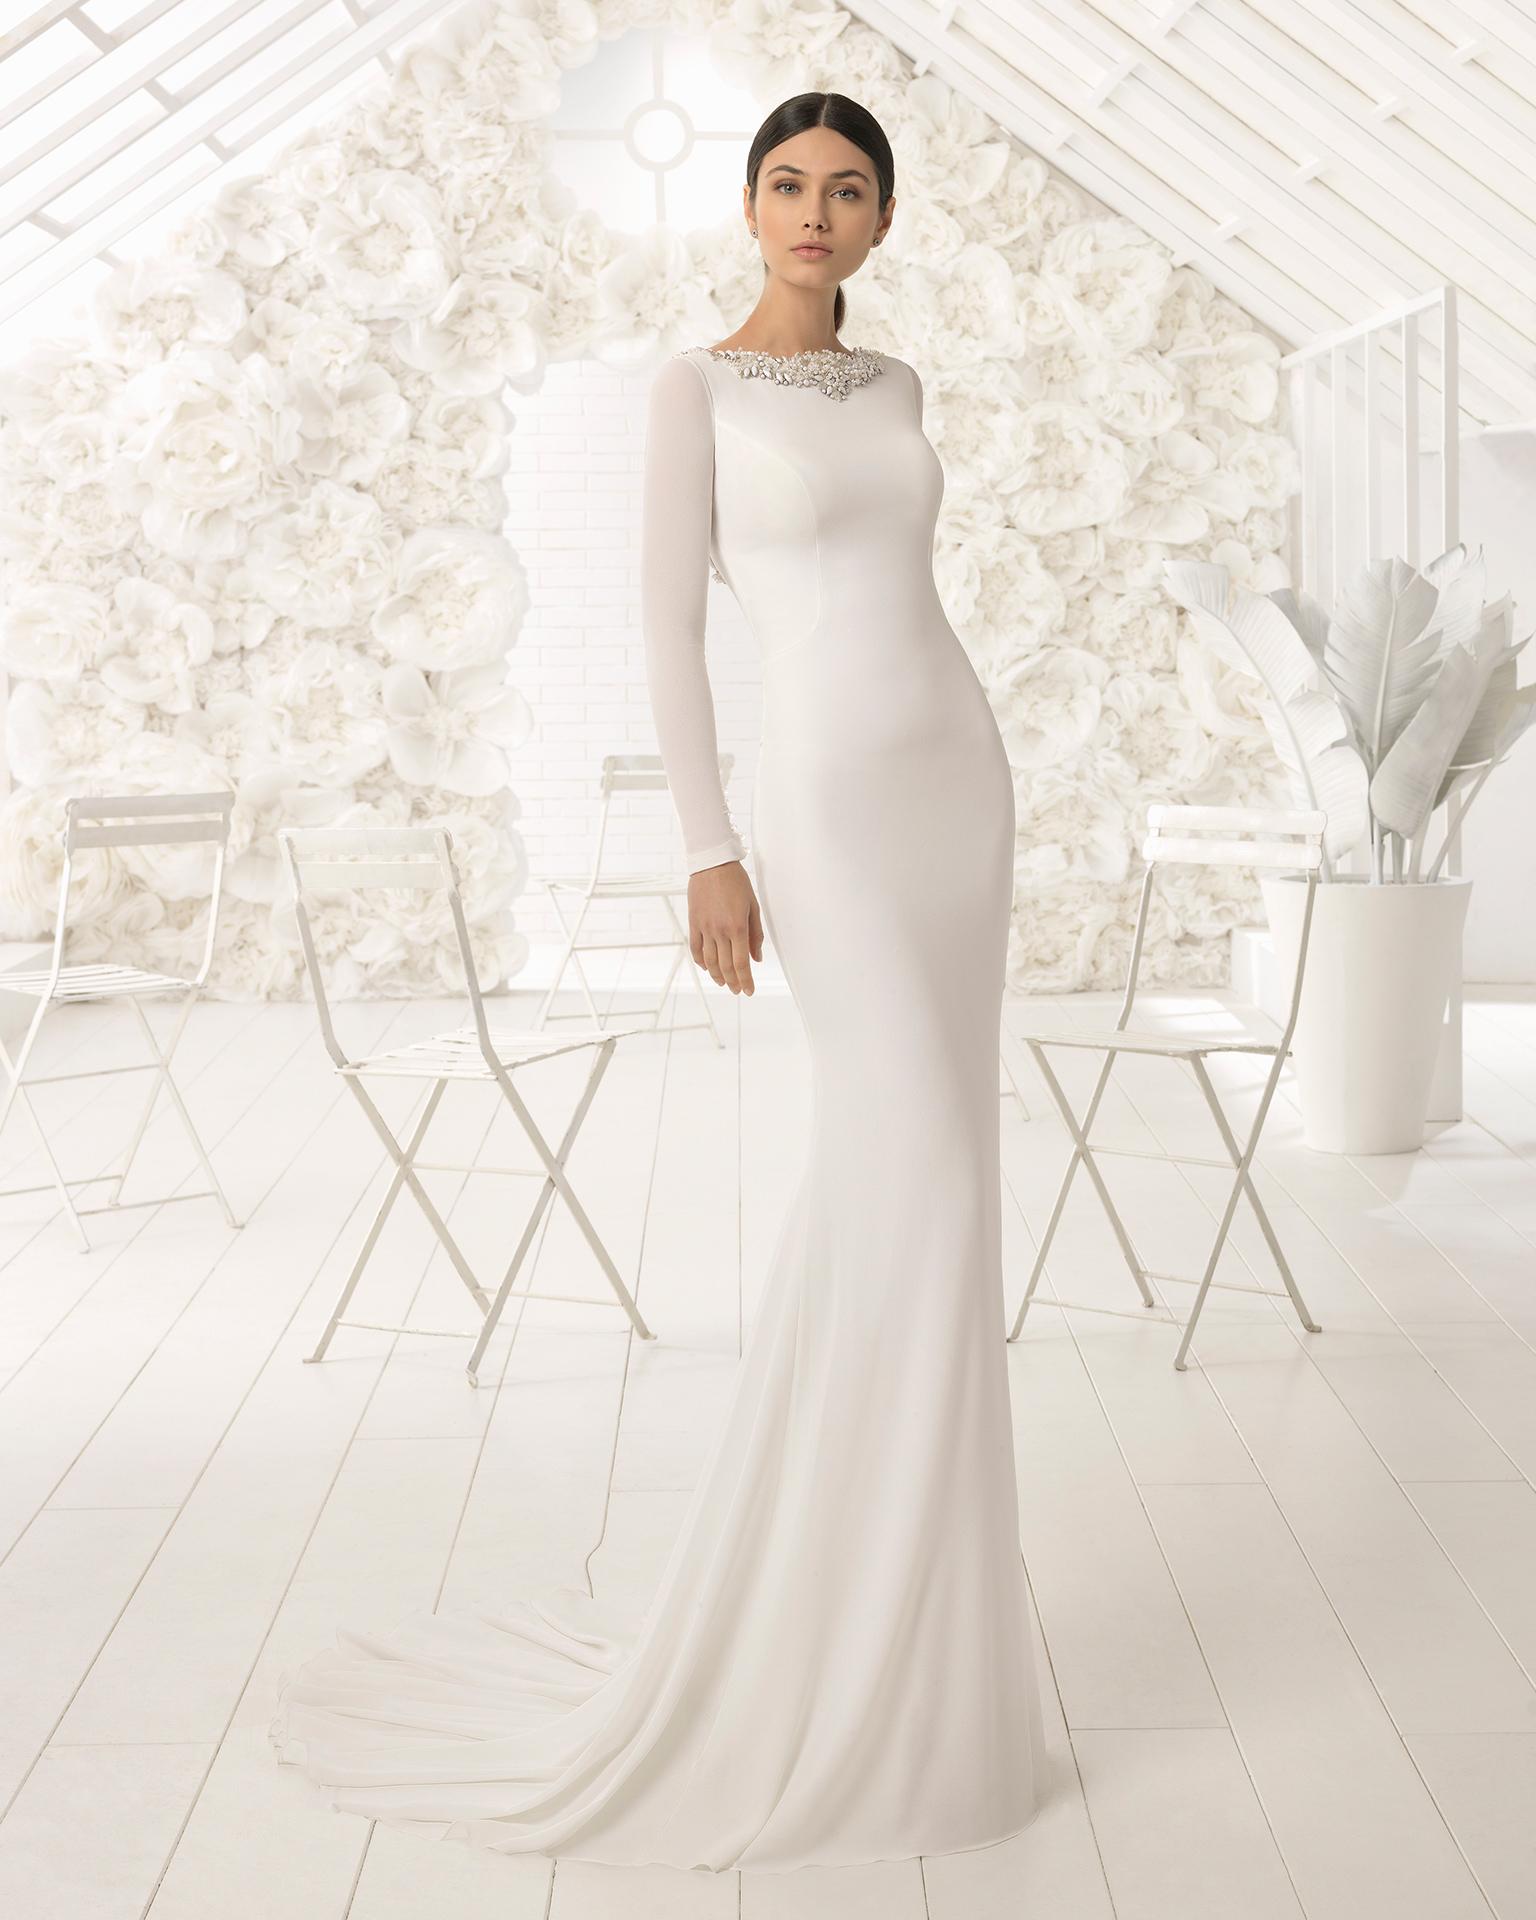 LAURA - 2018 Bridal Collection. Rosa Clará Soft Collection